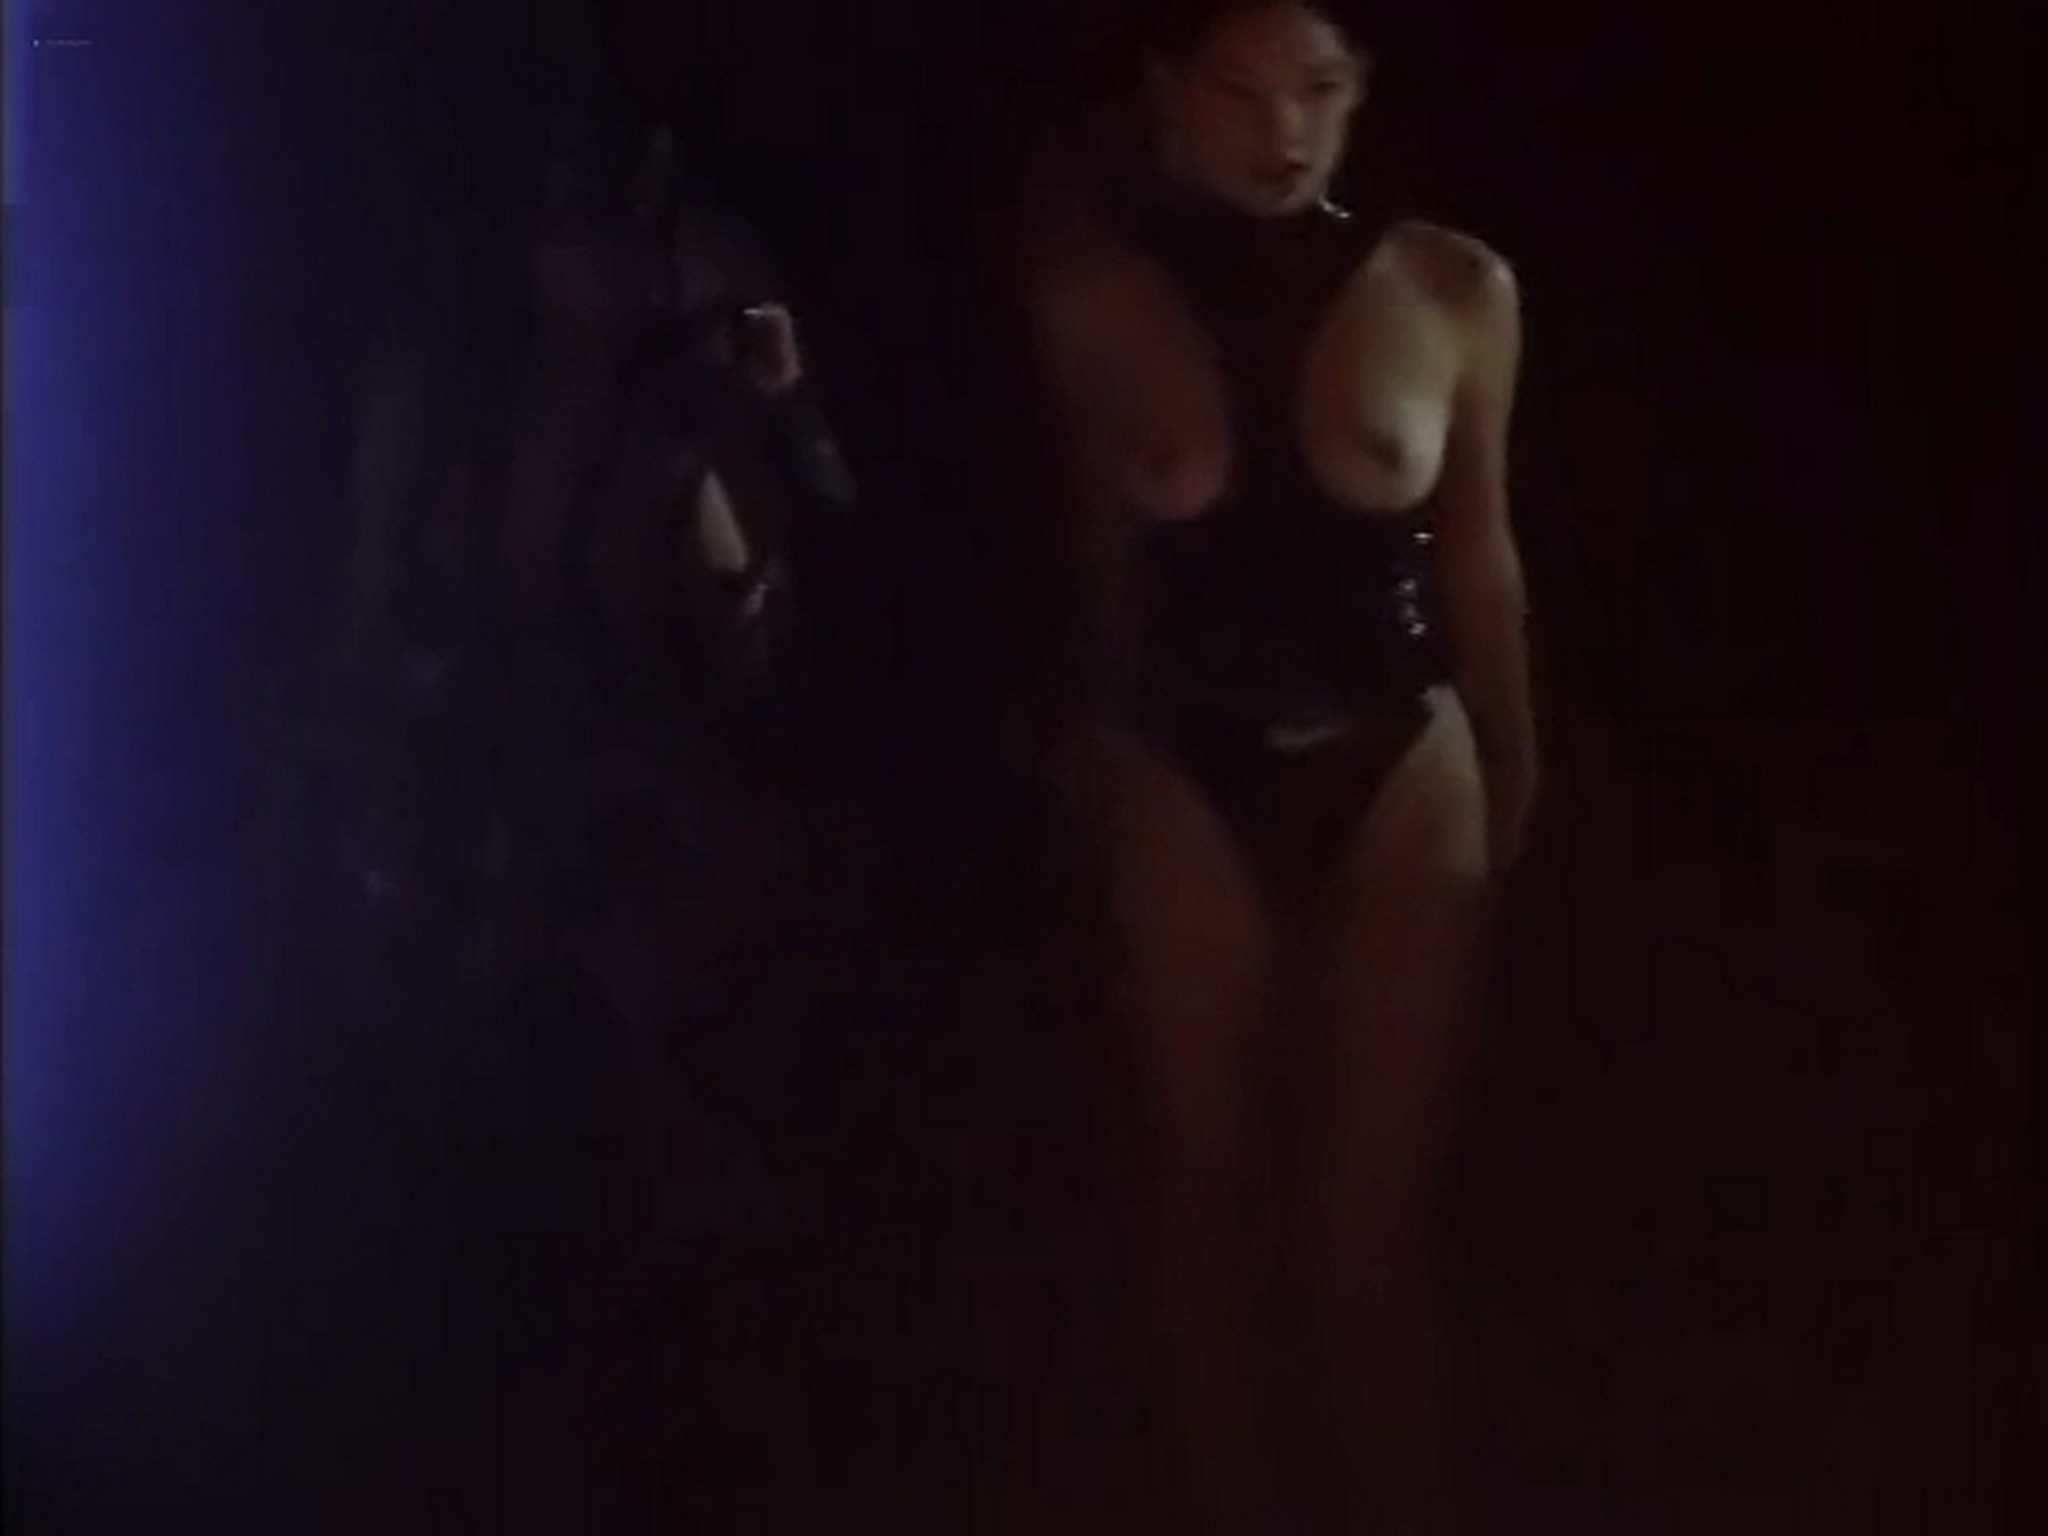 Neith Hunter nude Jennifer Burton Sue Kiel nude sex Red Shoe Diaries How I Met My Husband 1992 s1e13 6